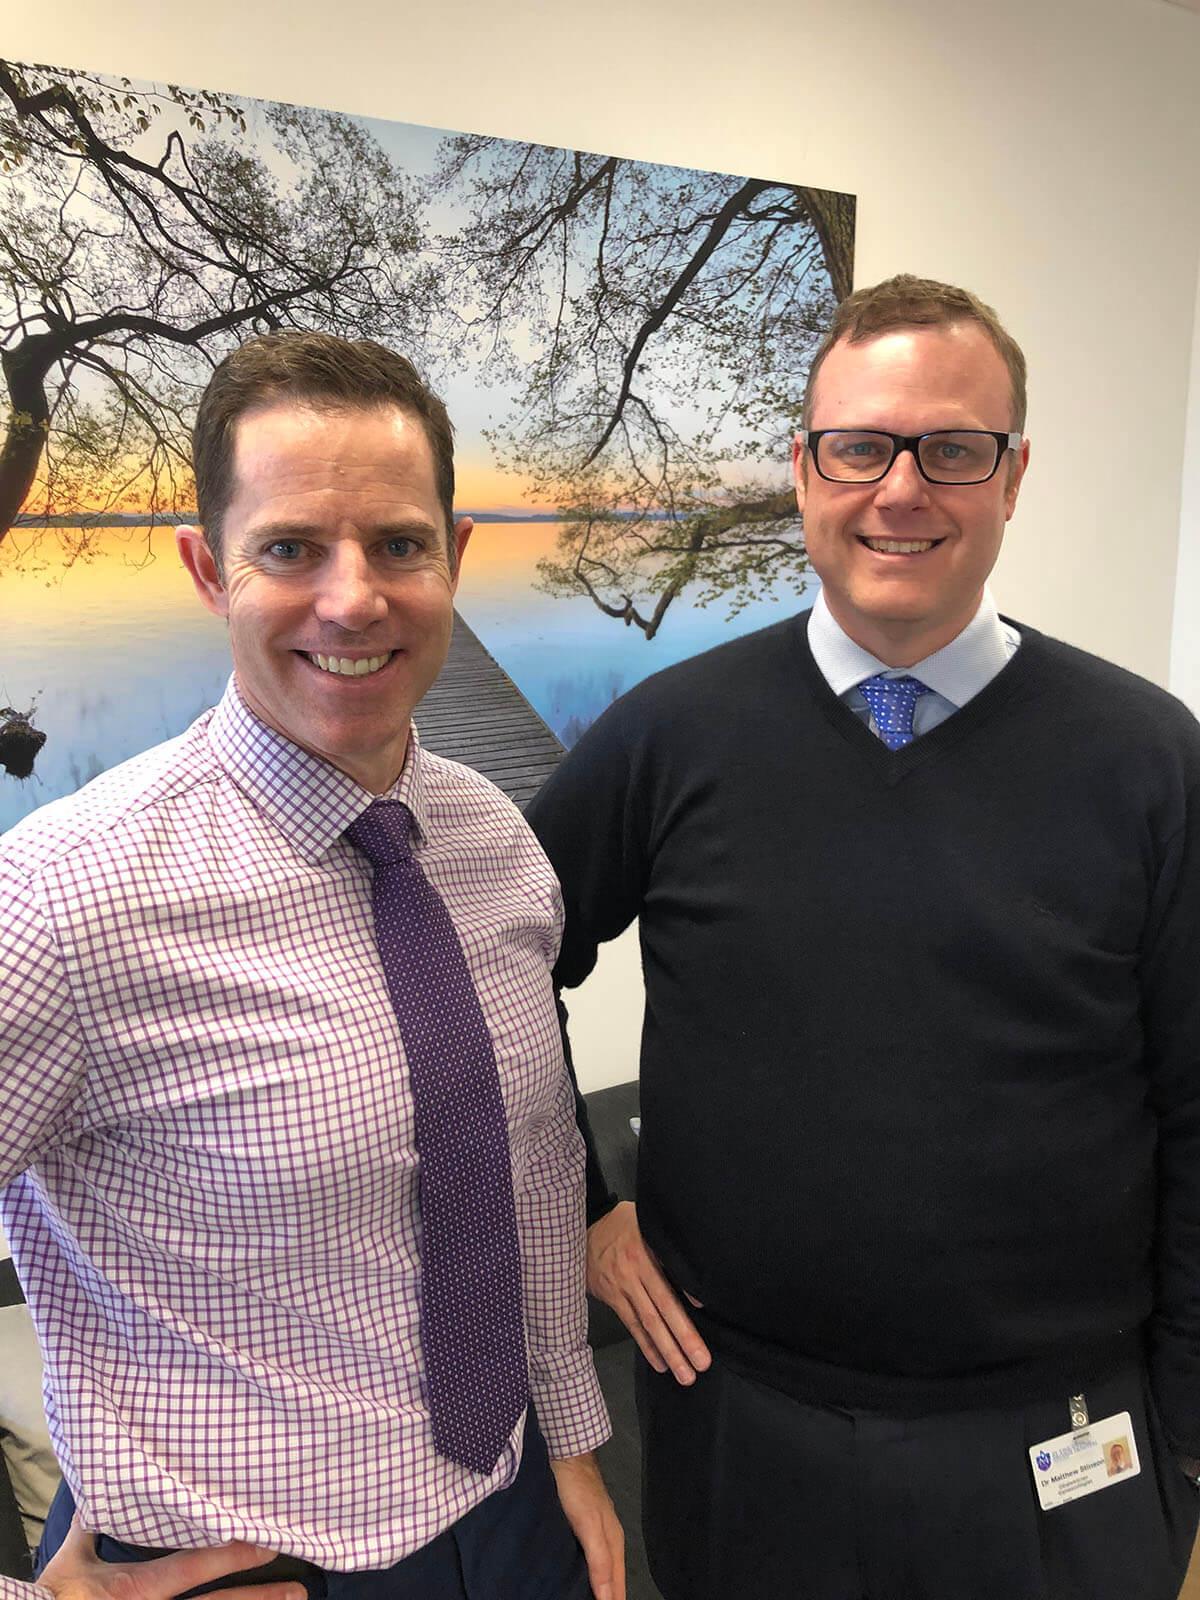 Dr David Chettle and Dr Matthew Stinson